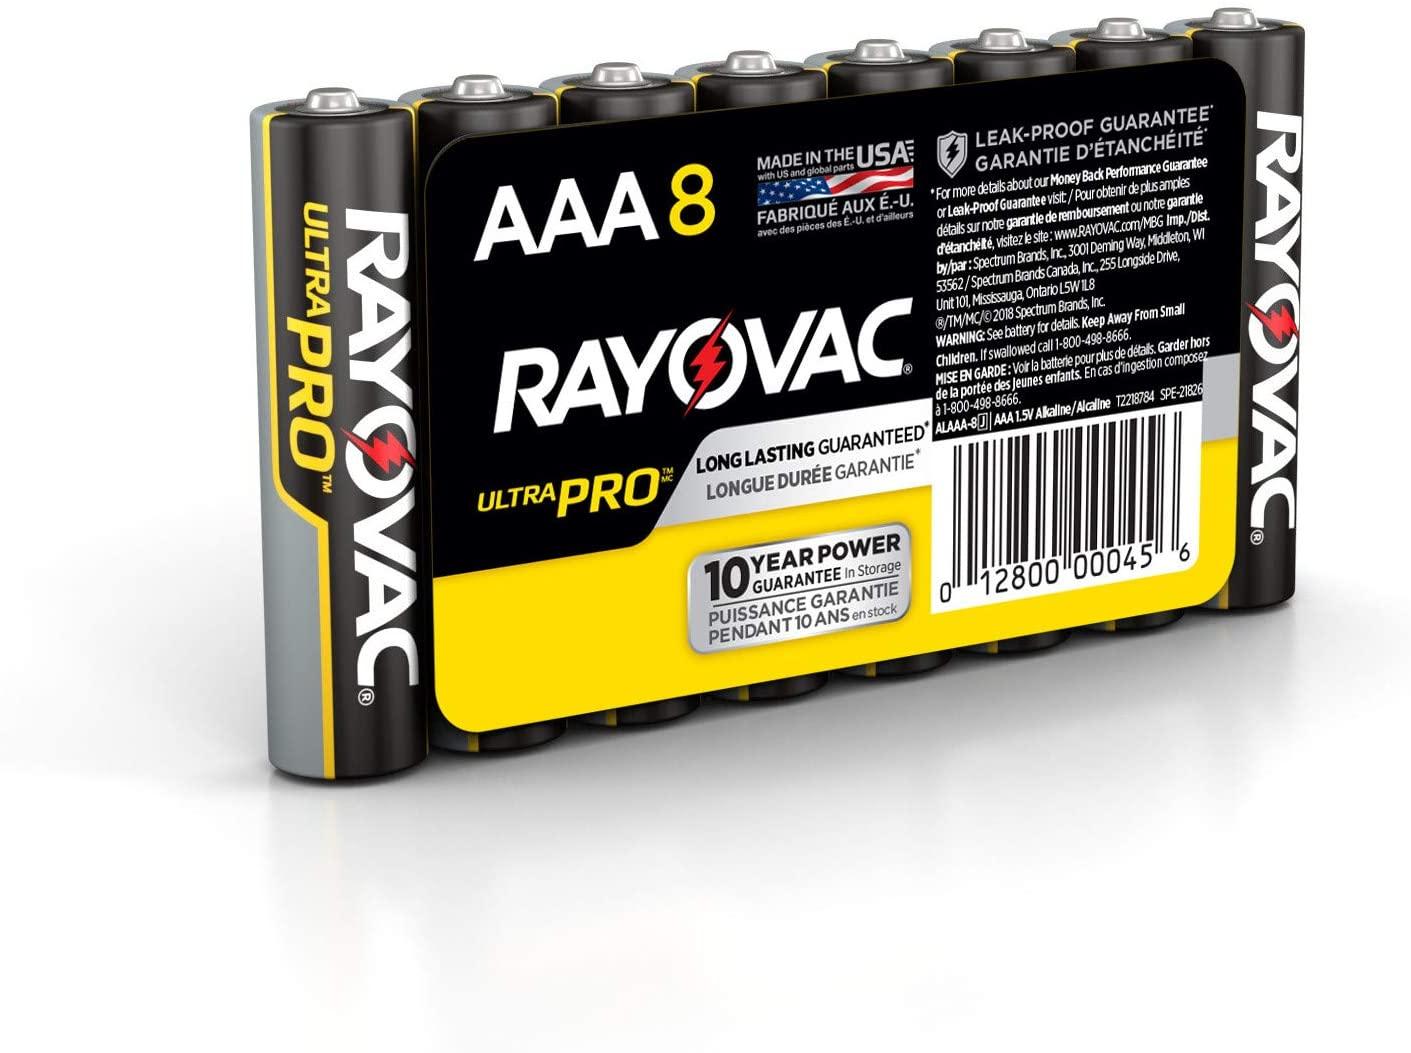 Rayovac AAA Batteries, Ultra Pro Alkaline AAA Cell Batteries (8 Battery Count)